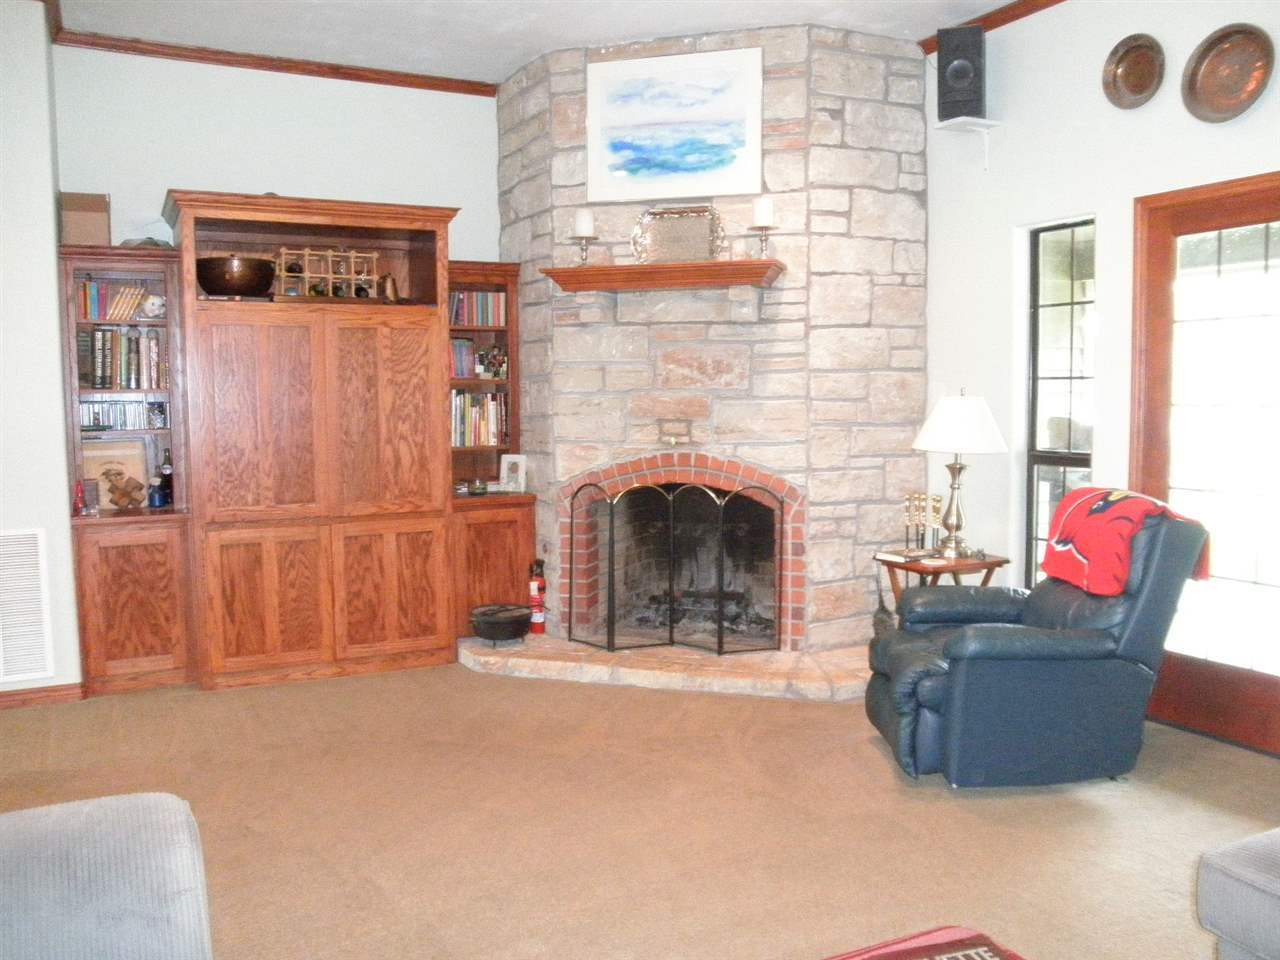 Sold Intraoffice W/MLS | 6855 Lake Road  Ponca City, OK 74604 1